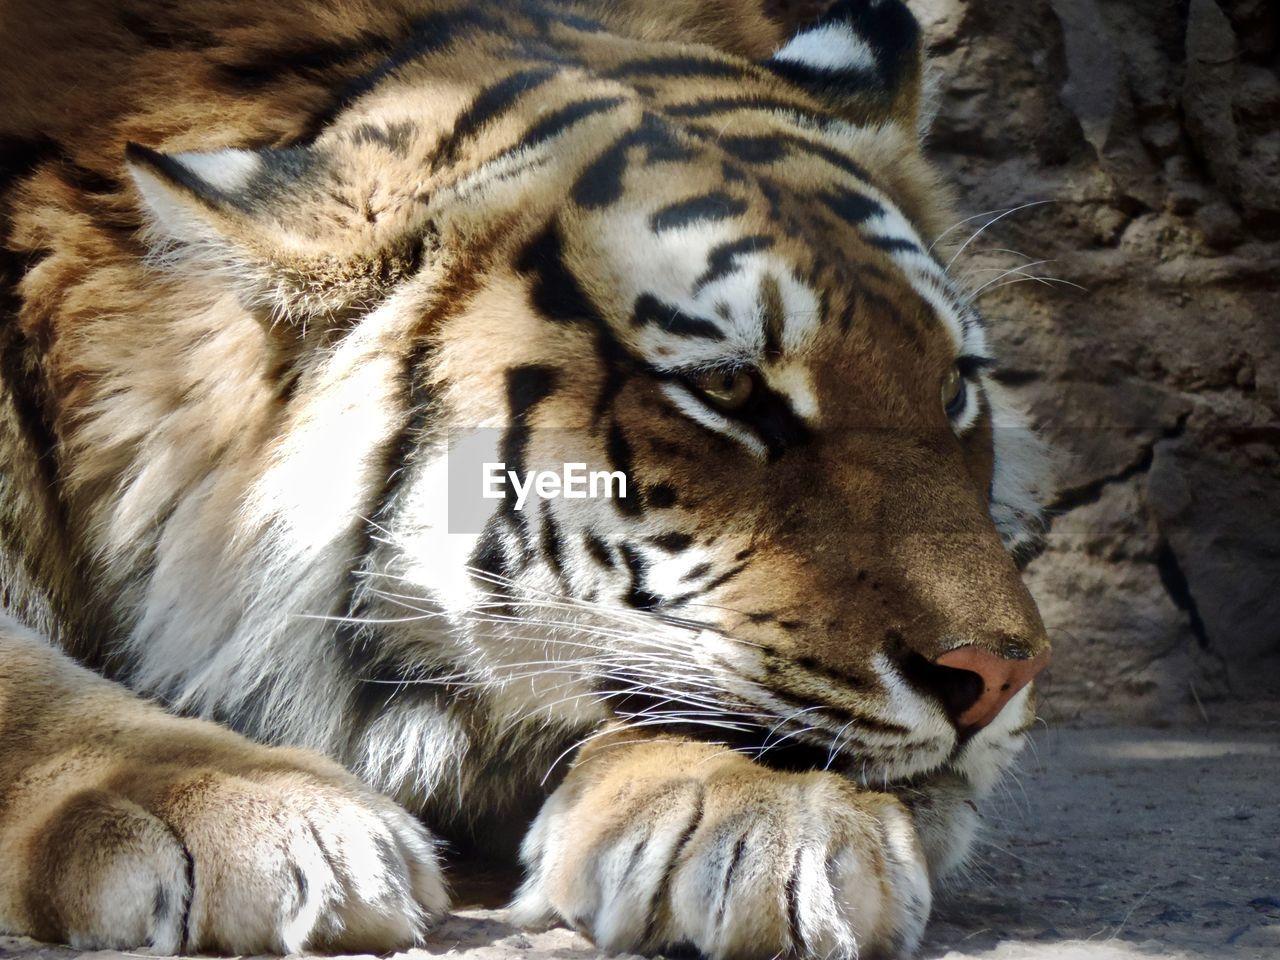 animal themes, one animal, tiger, animal, animals in the wild, animal wildlife, big cat, mammal, feline, cat, close-up, carnivora, animal body part, no people, vertebrate, endangered species, day, animal head, whisker, outdoors, zoo